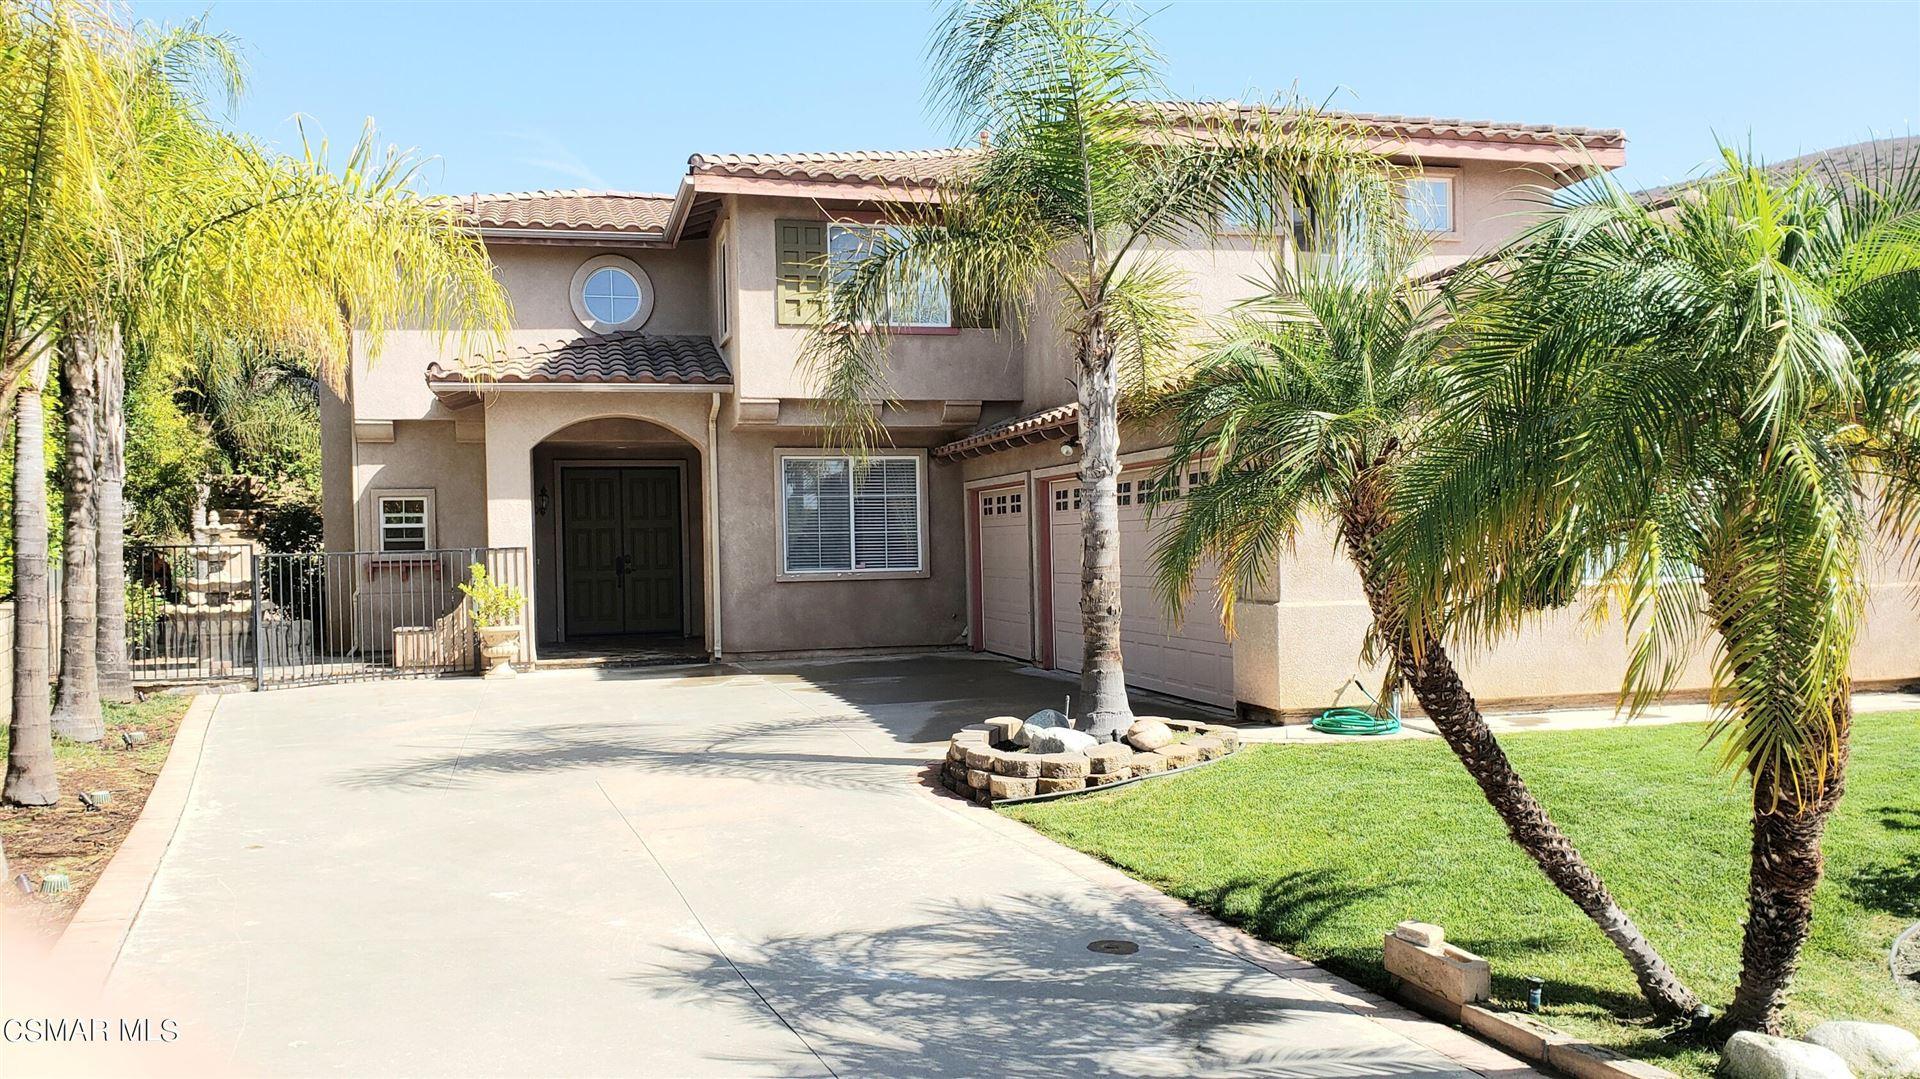 3312 Olivegrove Place, Thousand Oaks, CA 91362 - MLS#: 221004994